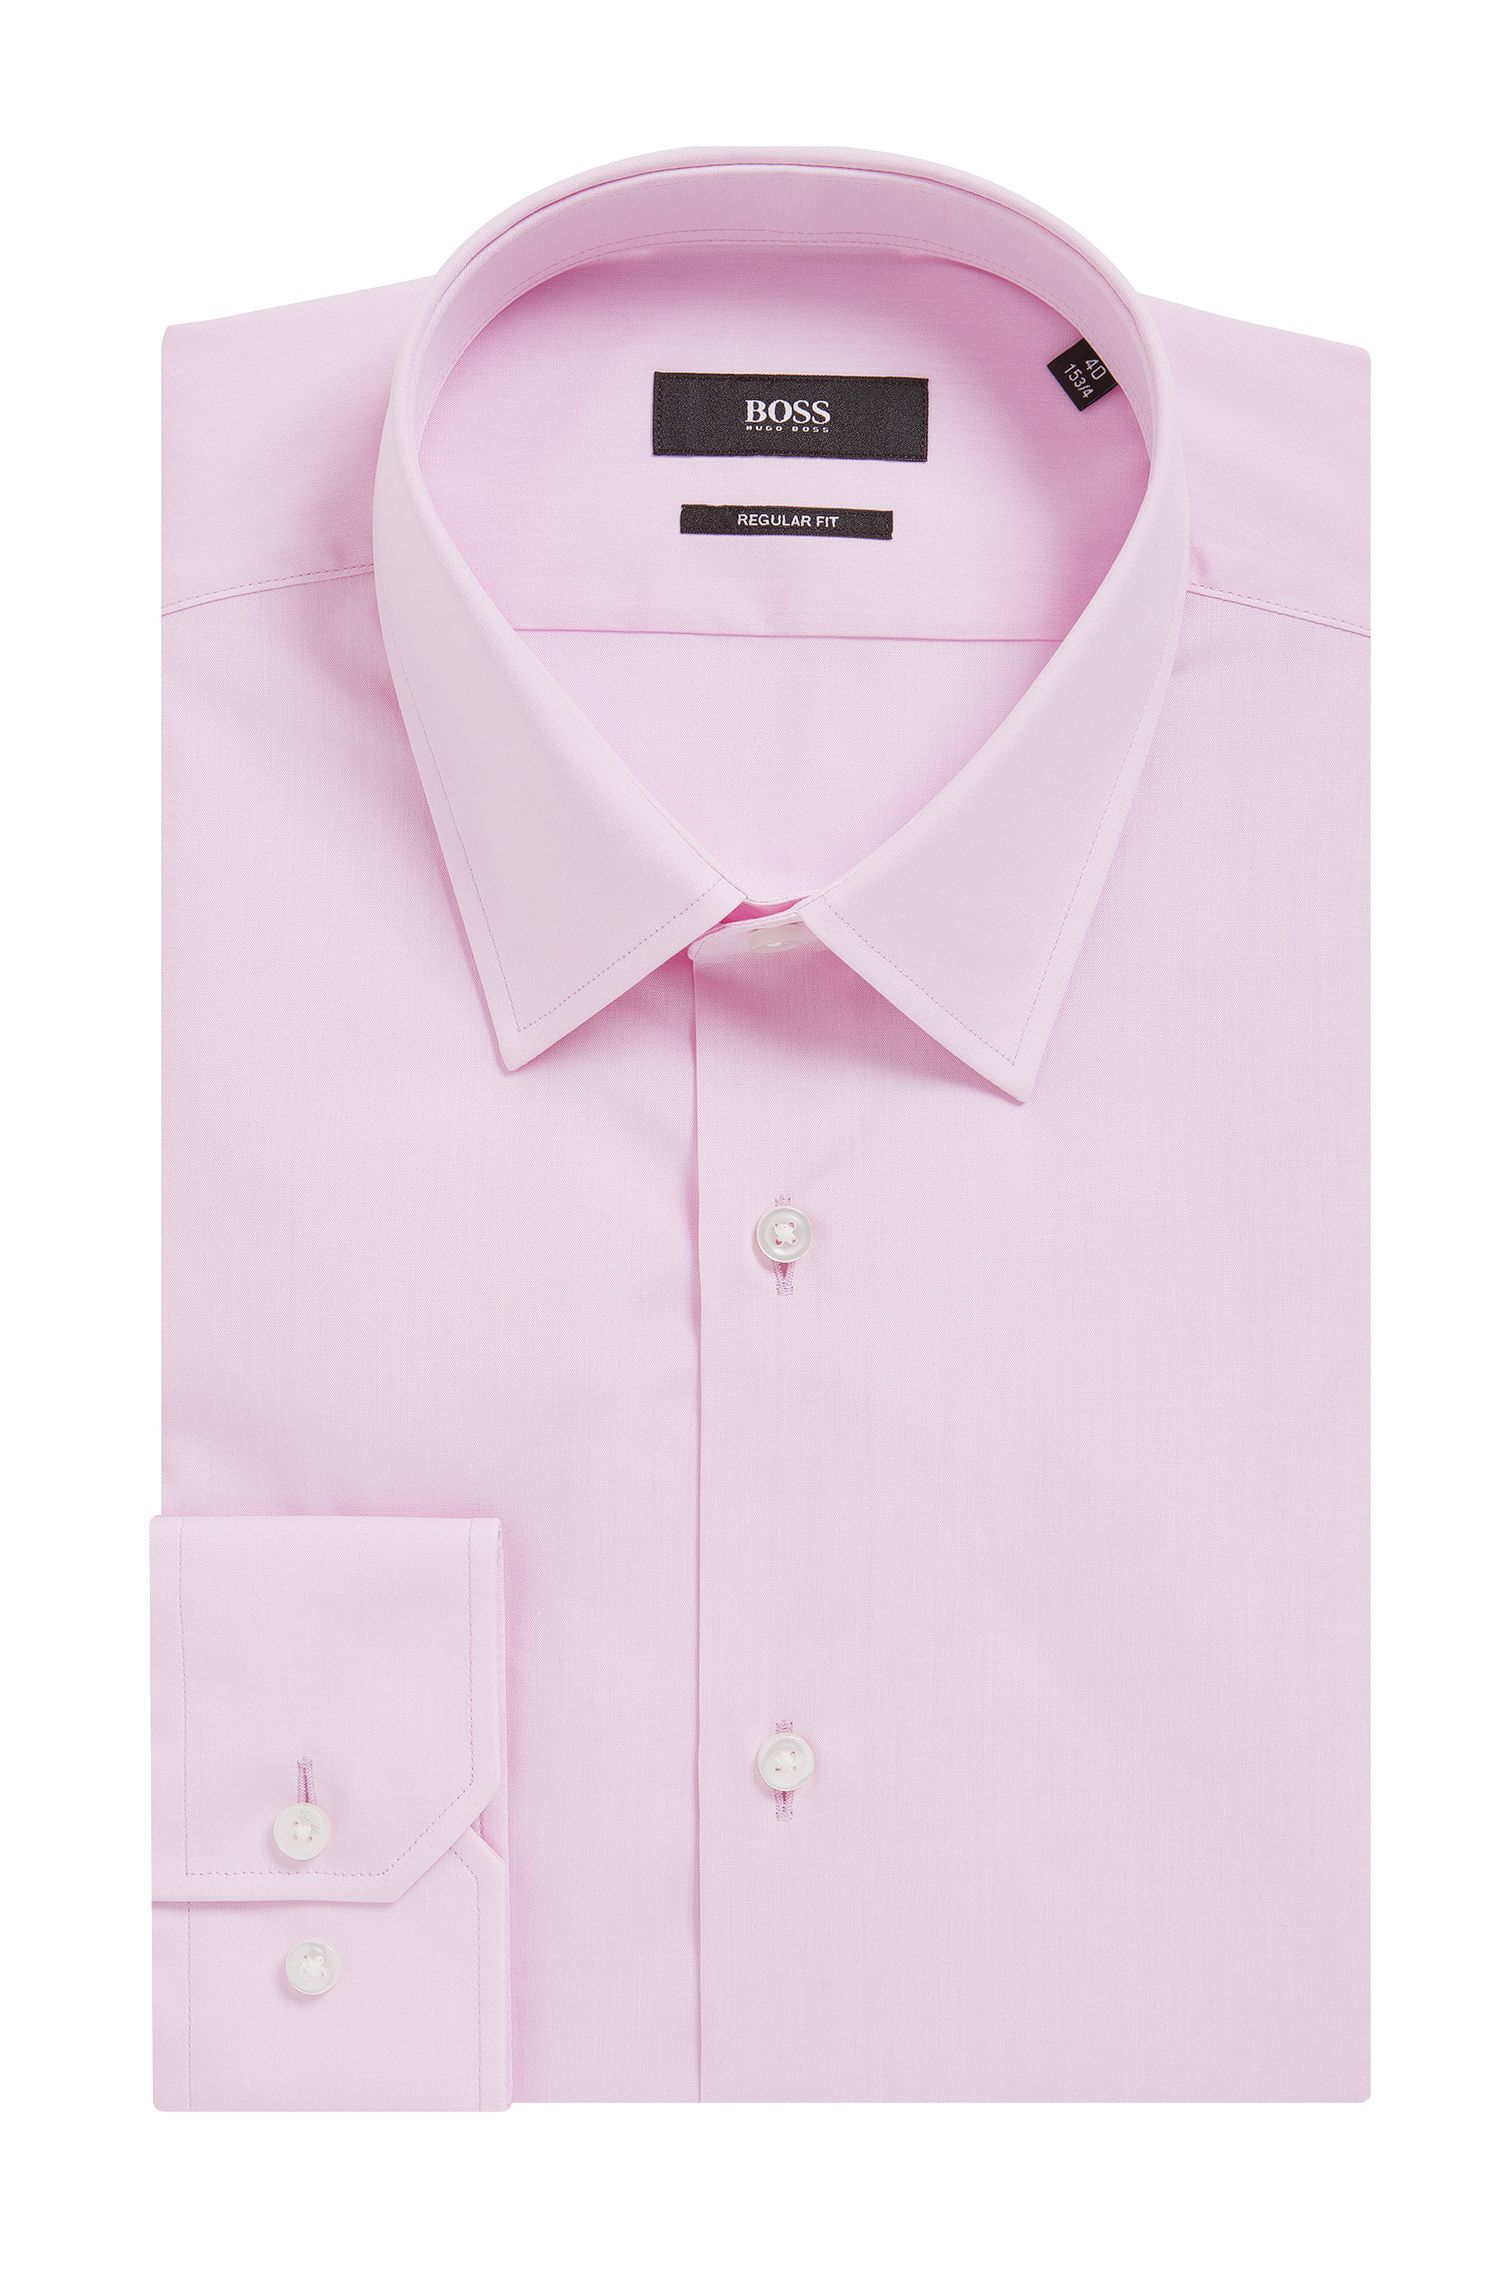 Chambray Cotton Dress Shirt, Regular Fit   Enzo